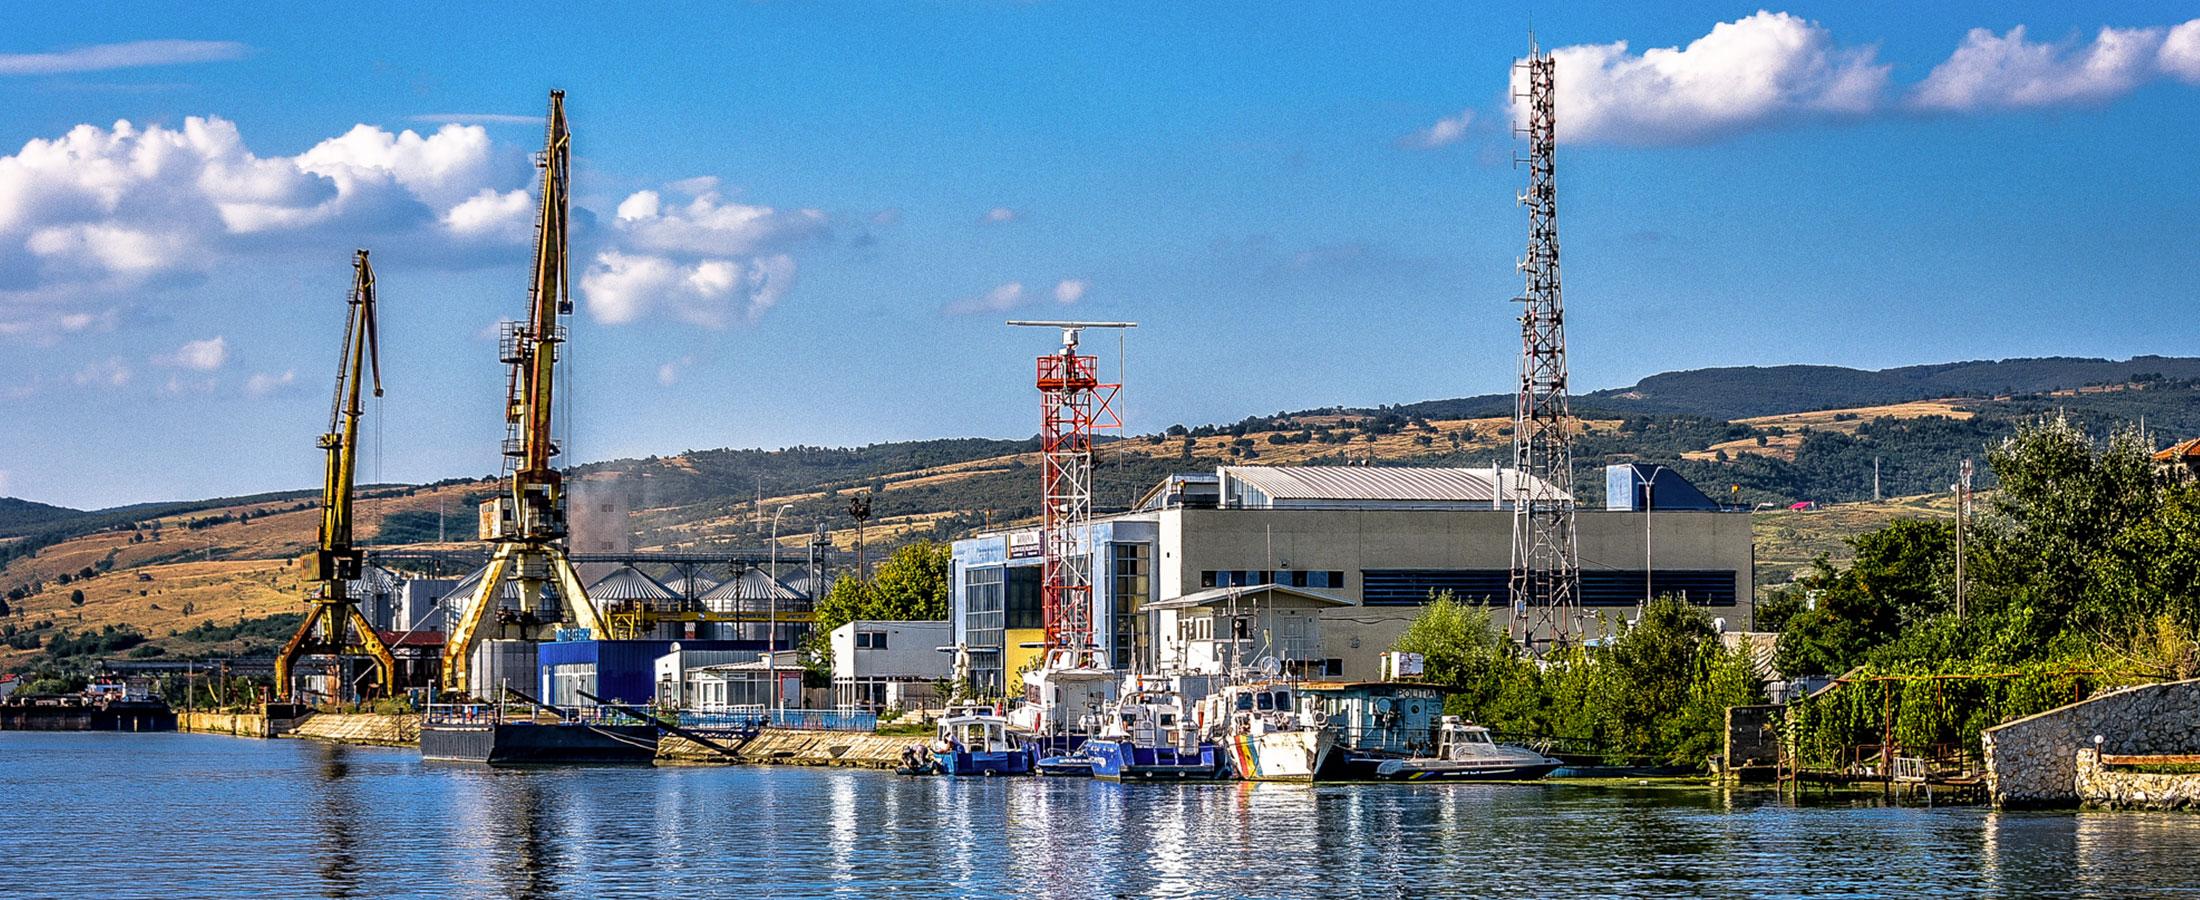 Panoramica-Portul-din-Moldova-Noua